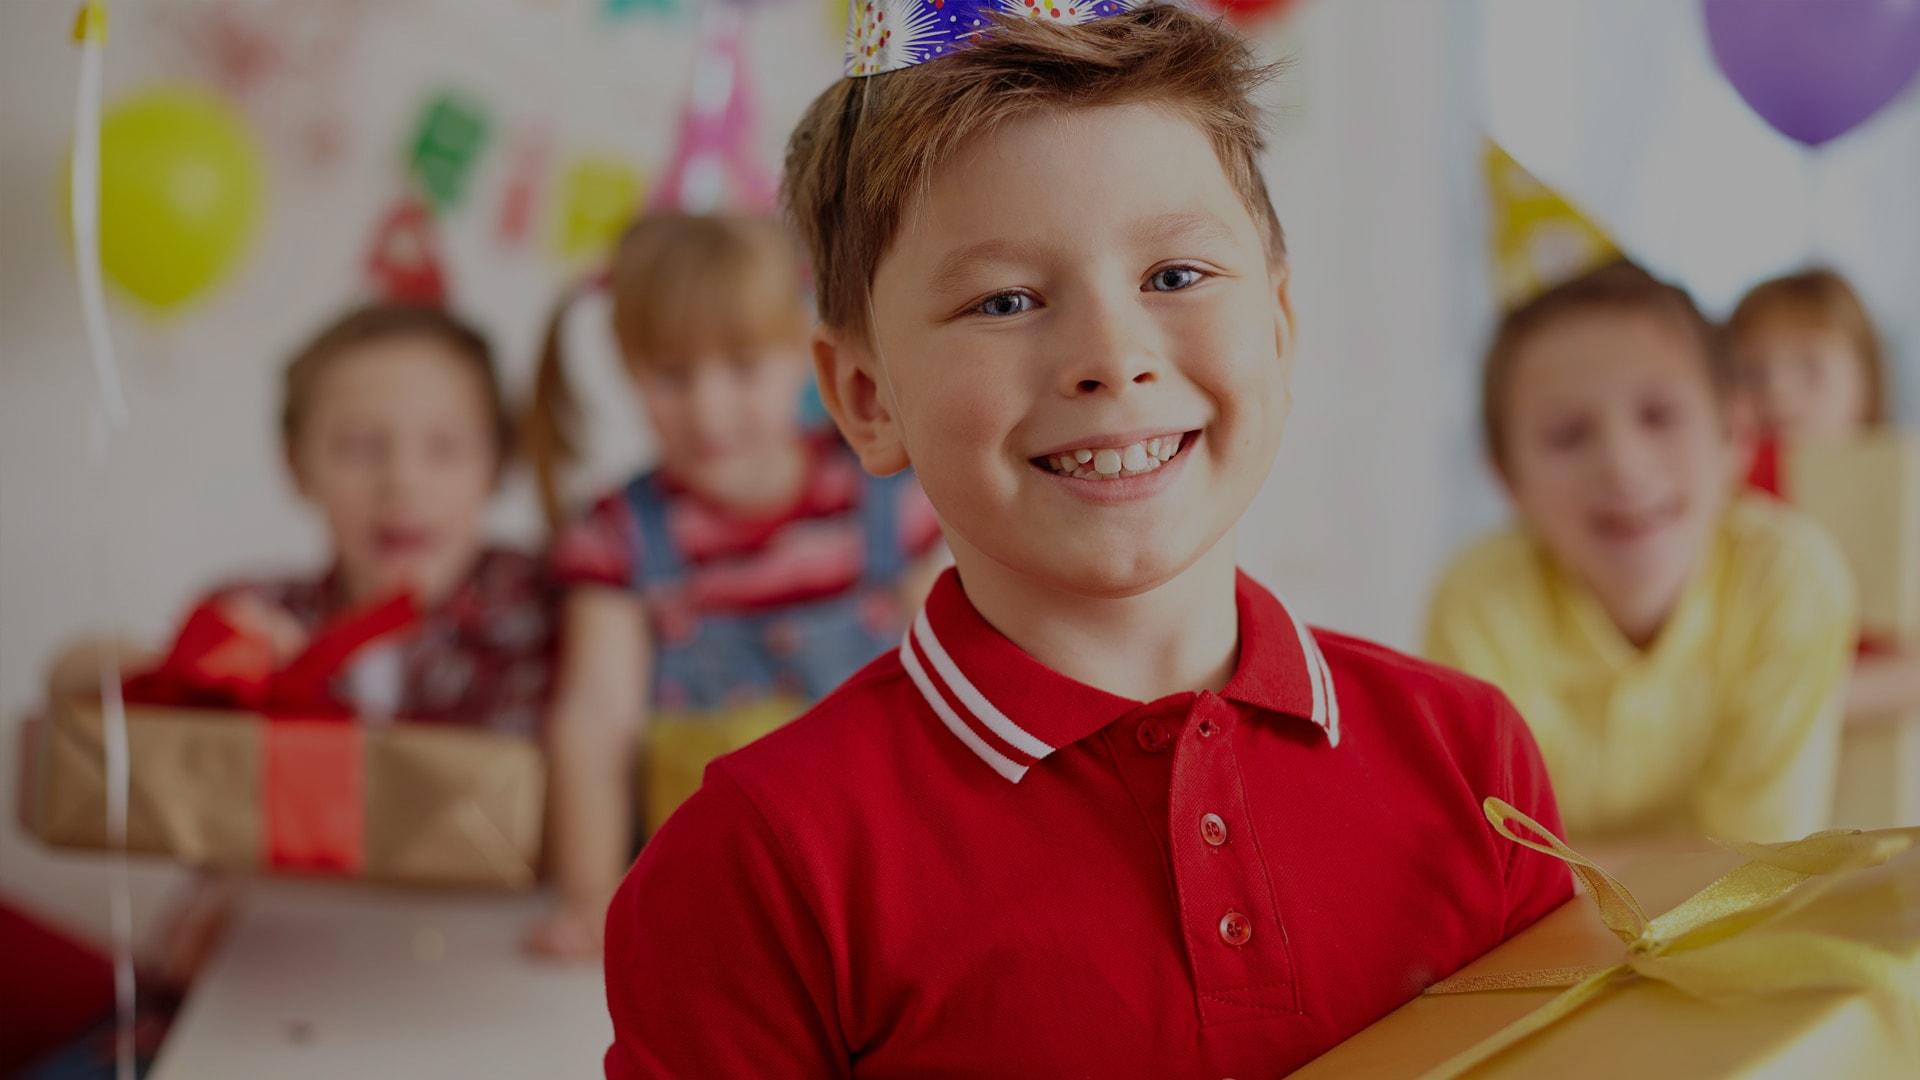 Joyful Learning Experiences